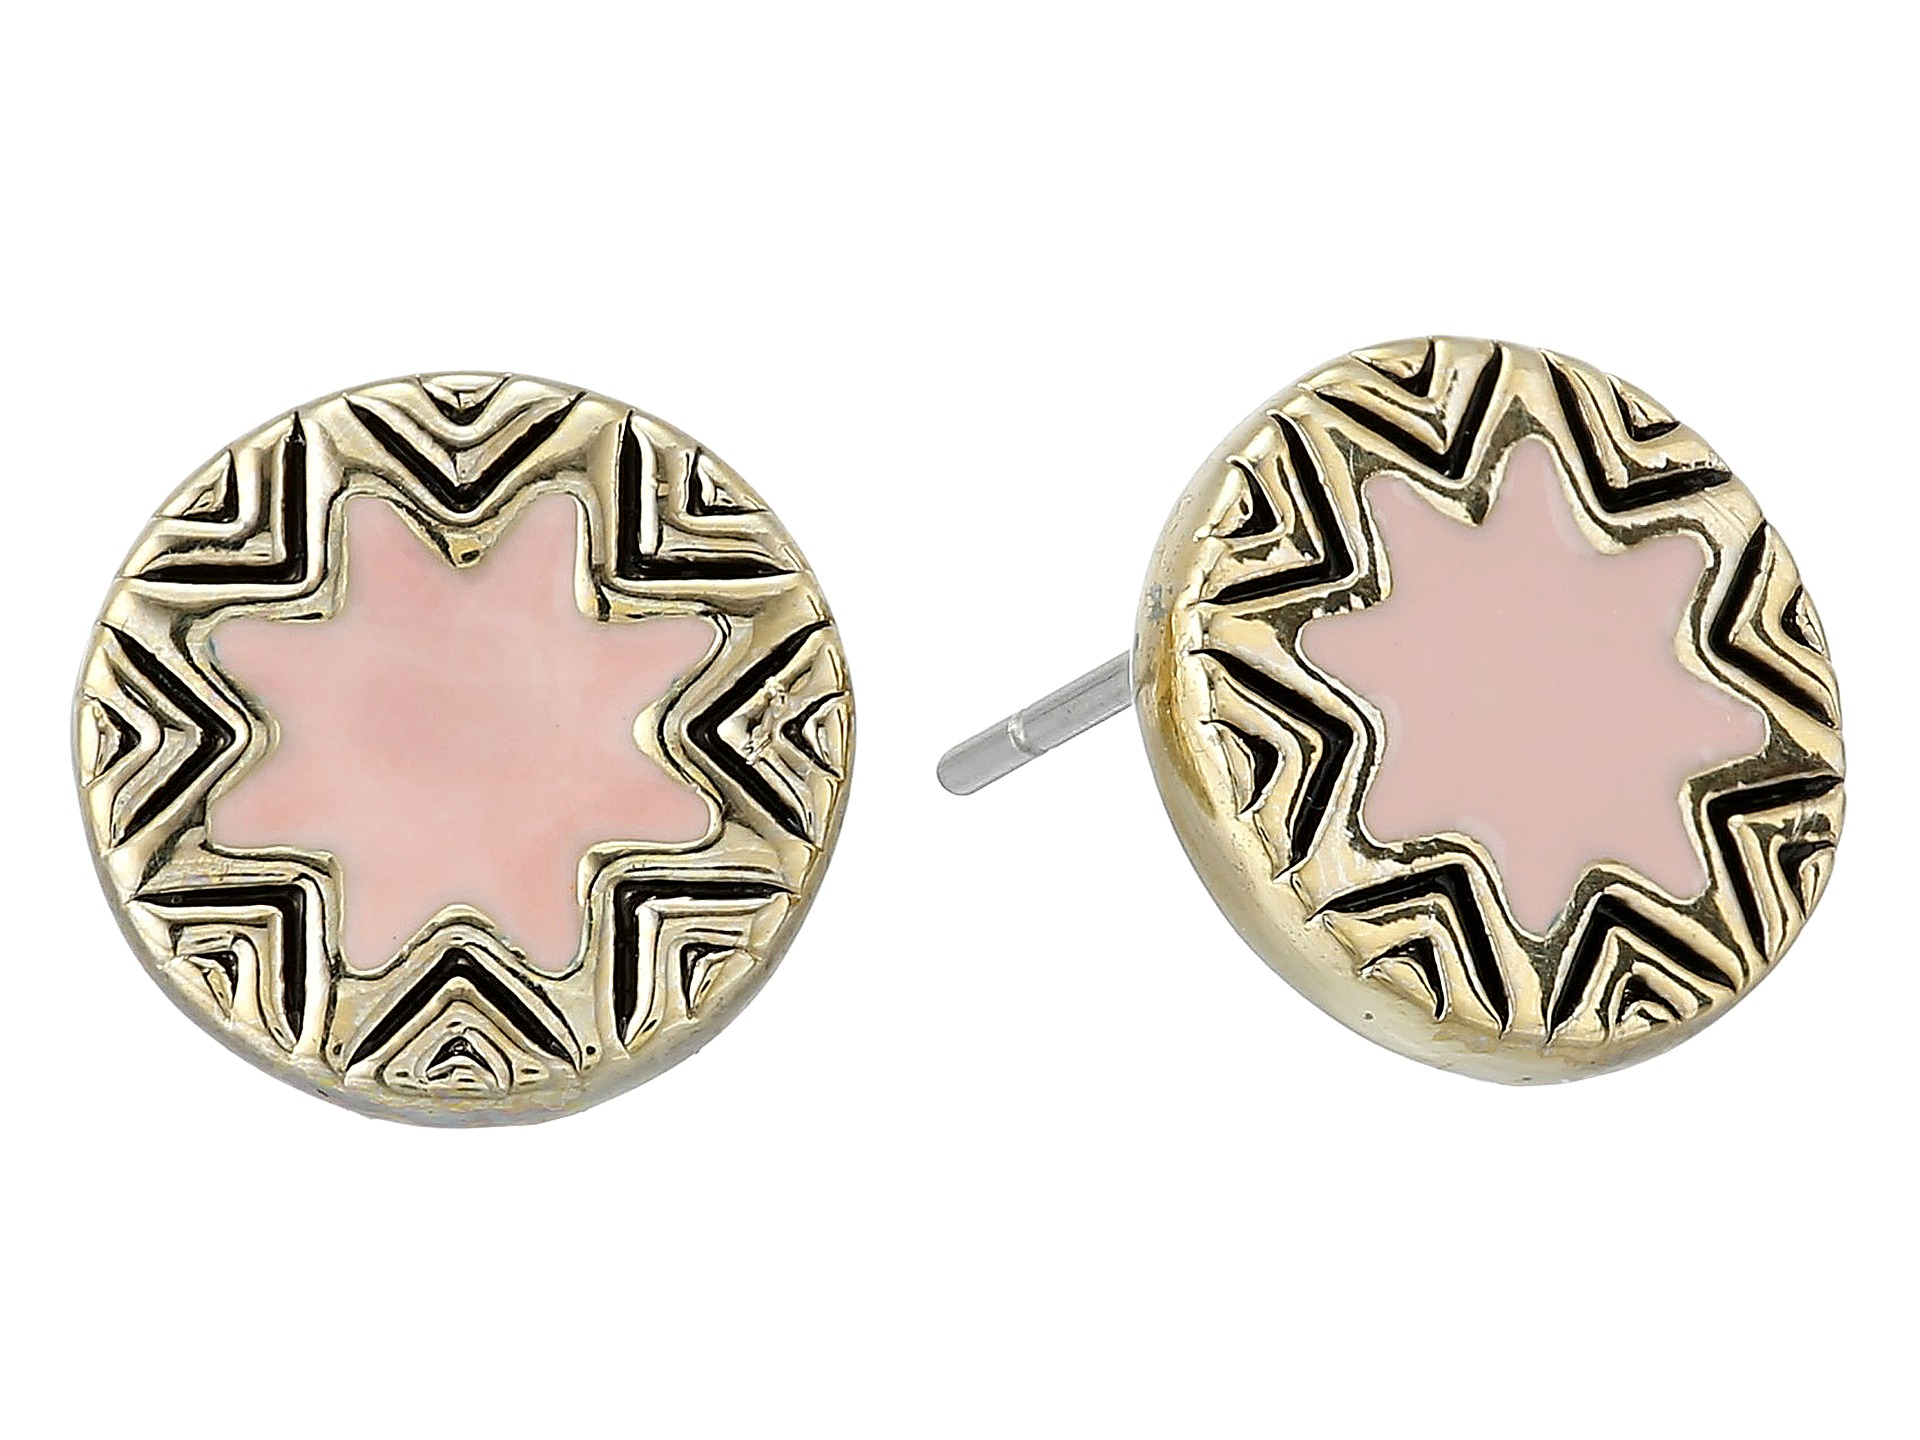 house of harlow 1960 mini sunburst stud earrings in pink